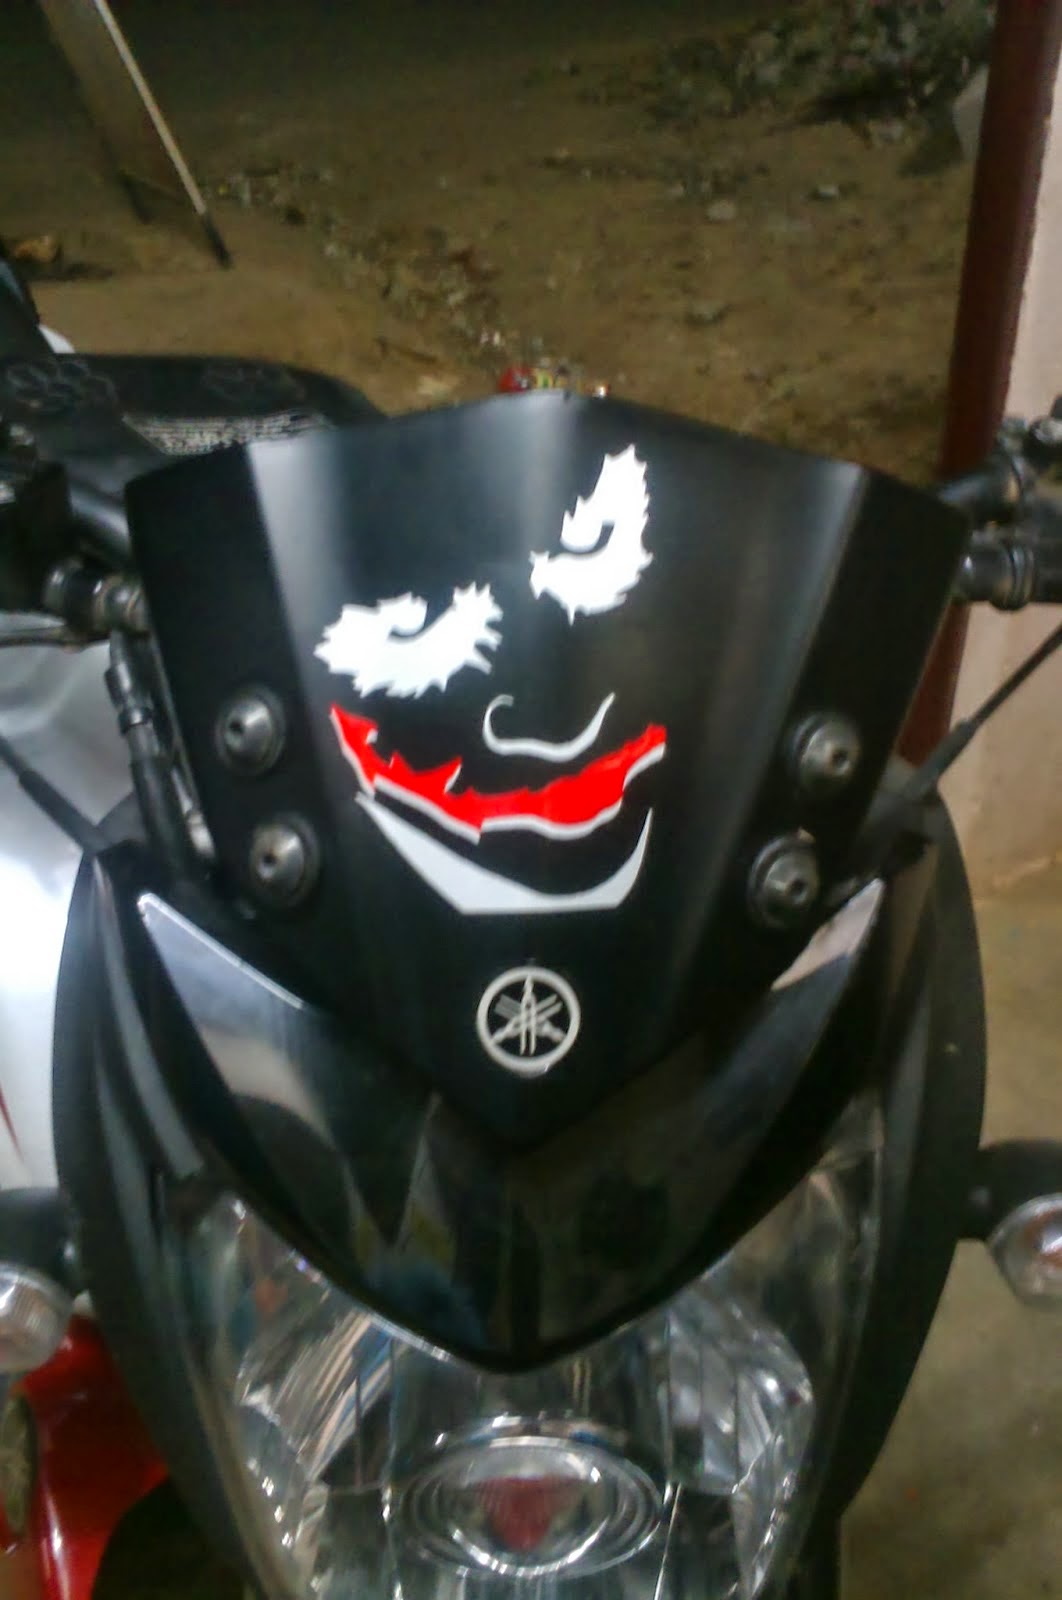 Bike stickers design india - R15 Visor Stickering